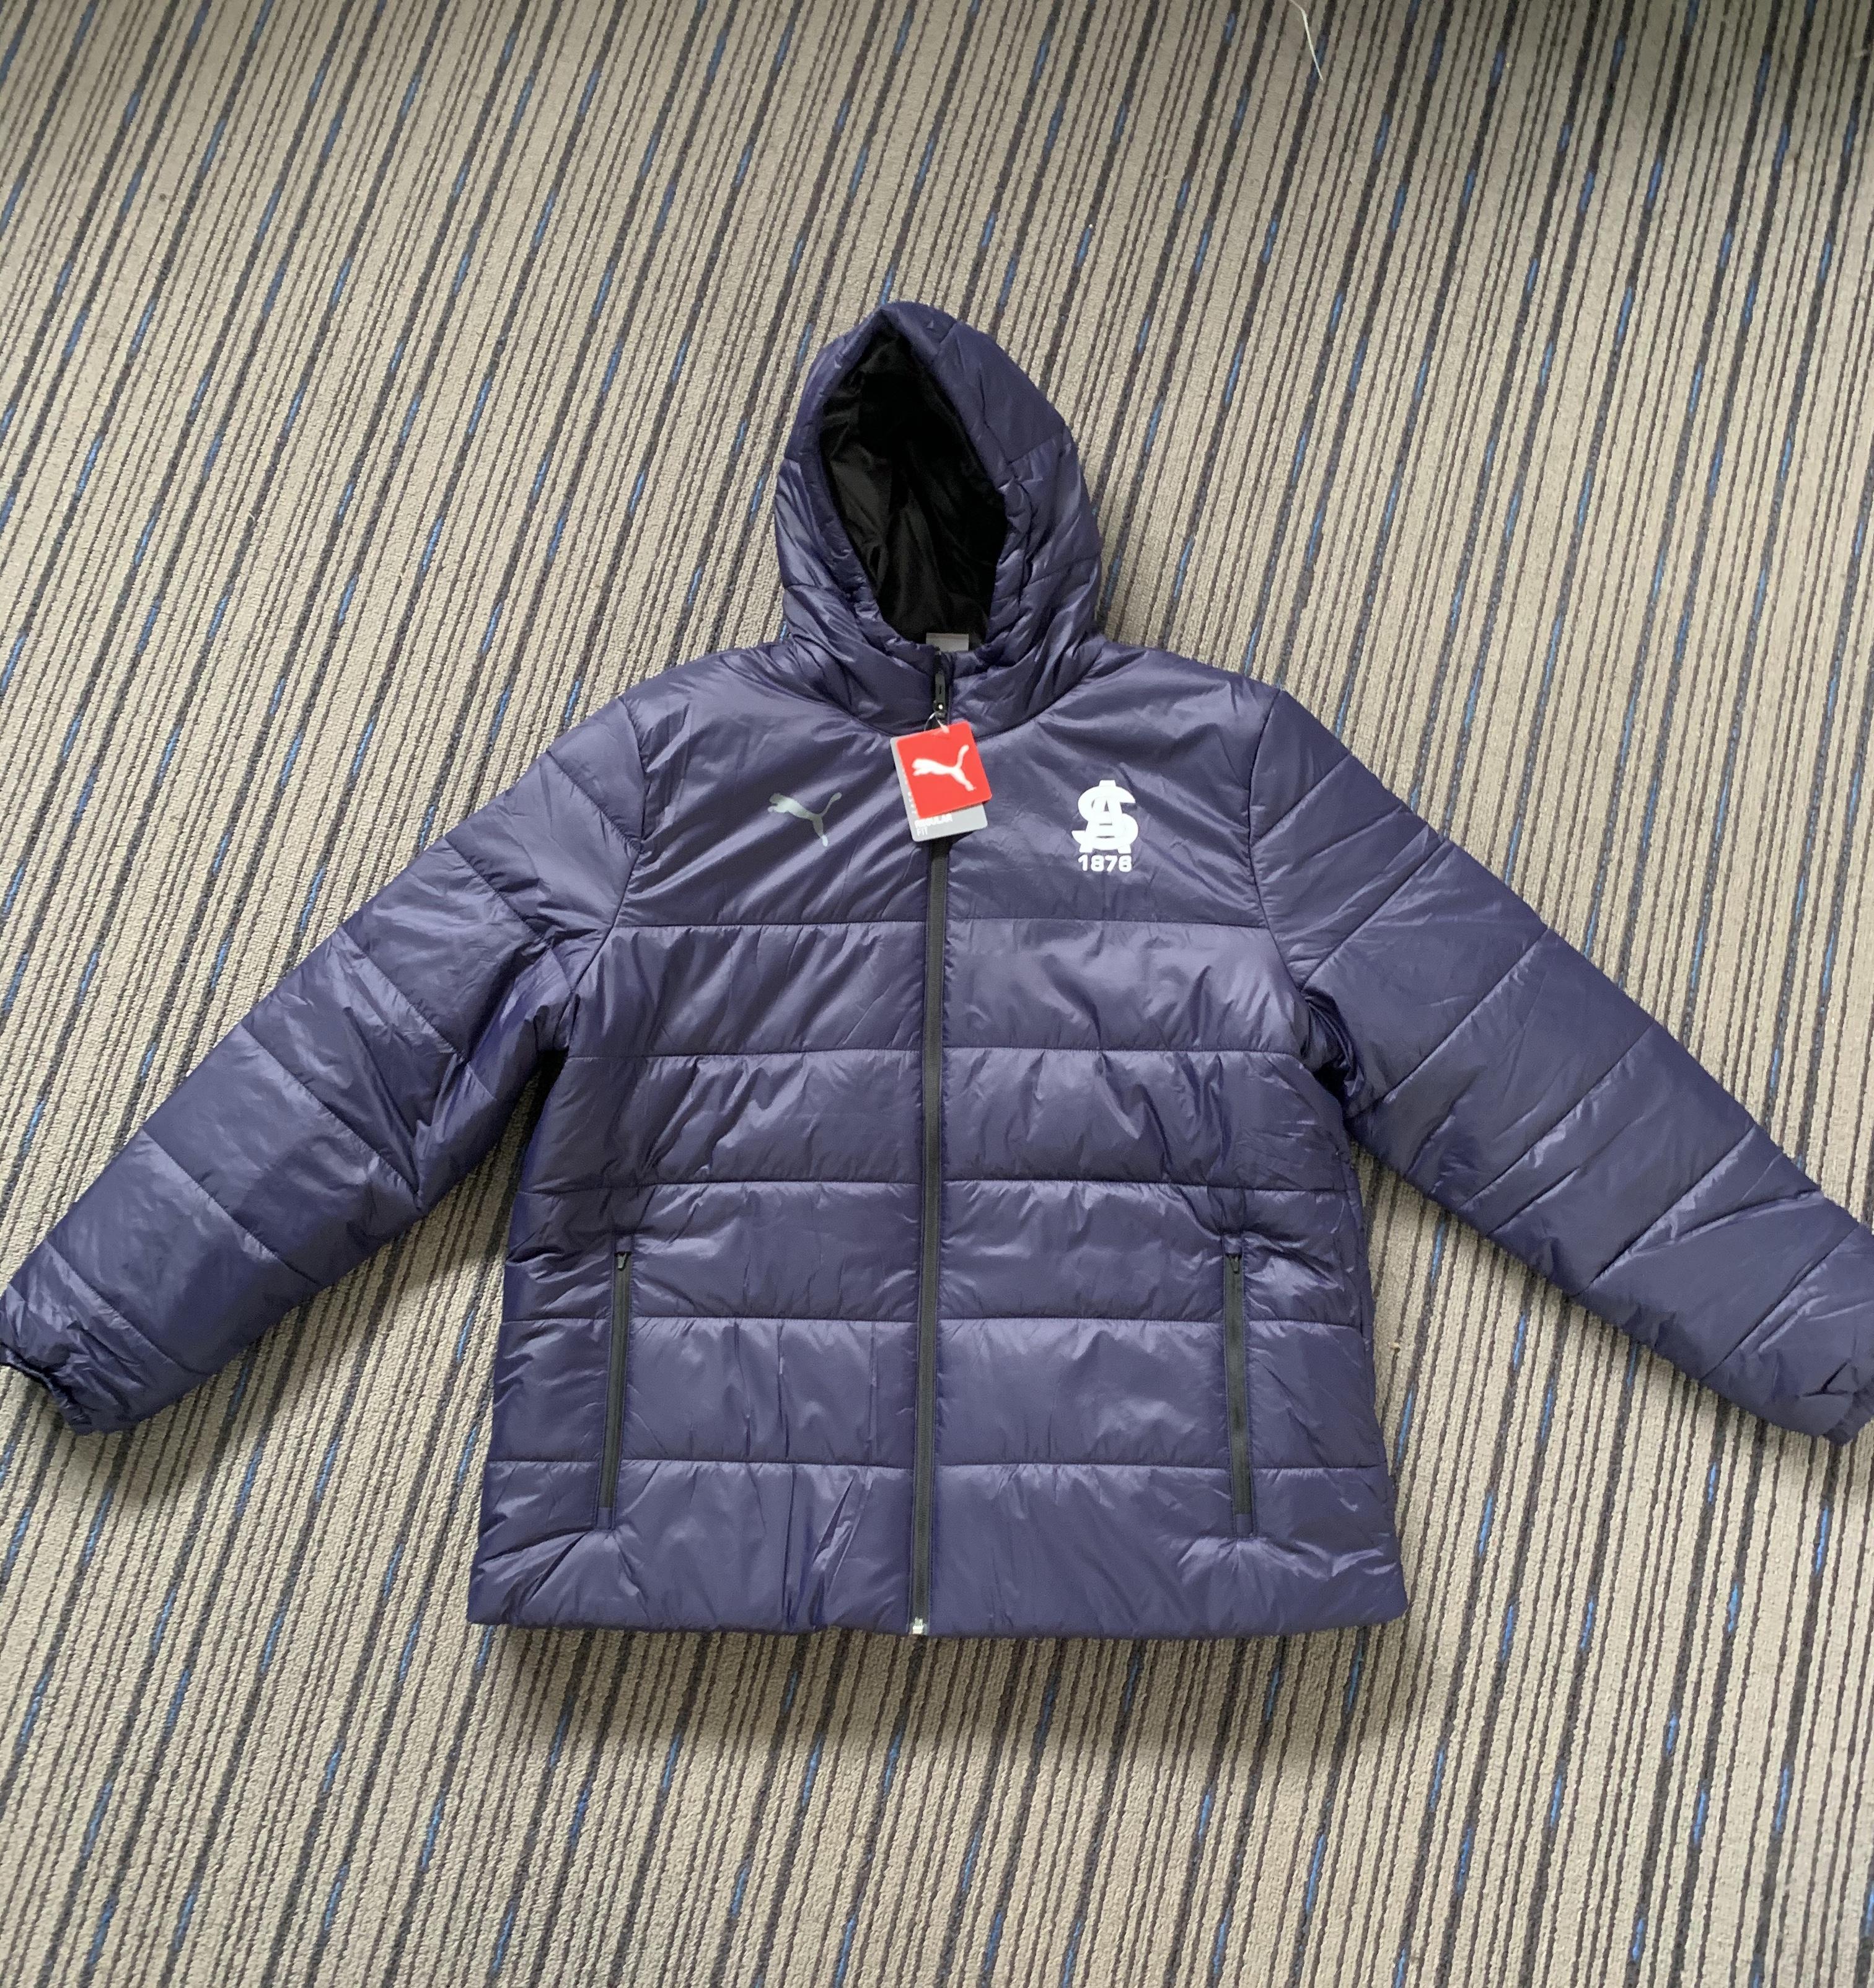 2021 PUMA Padded Jacket